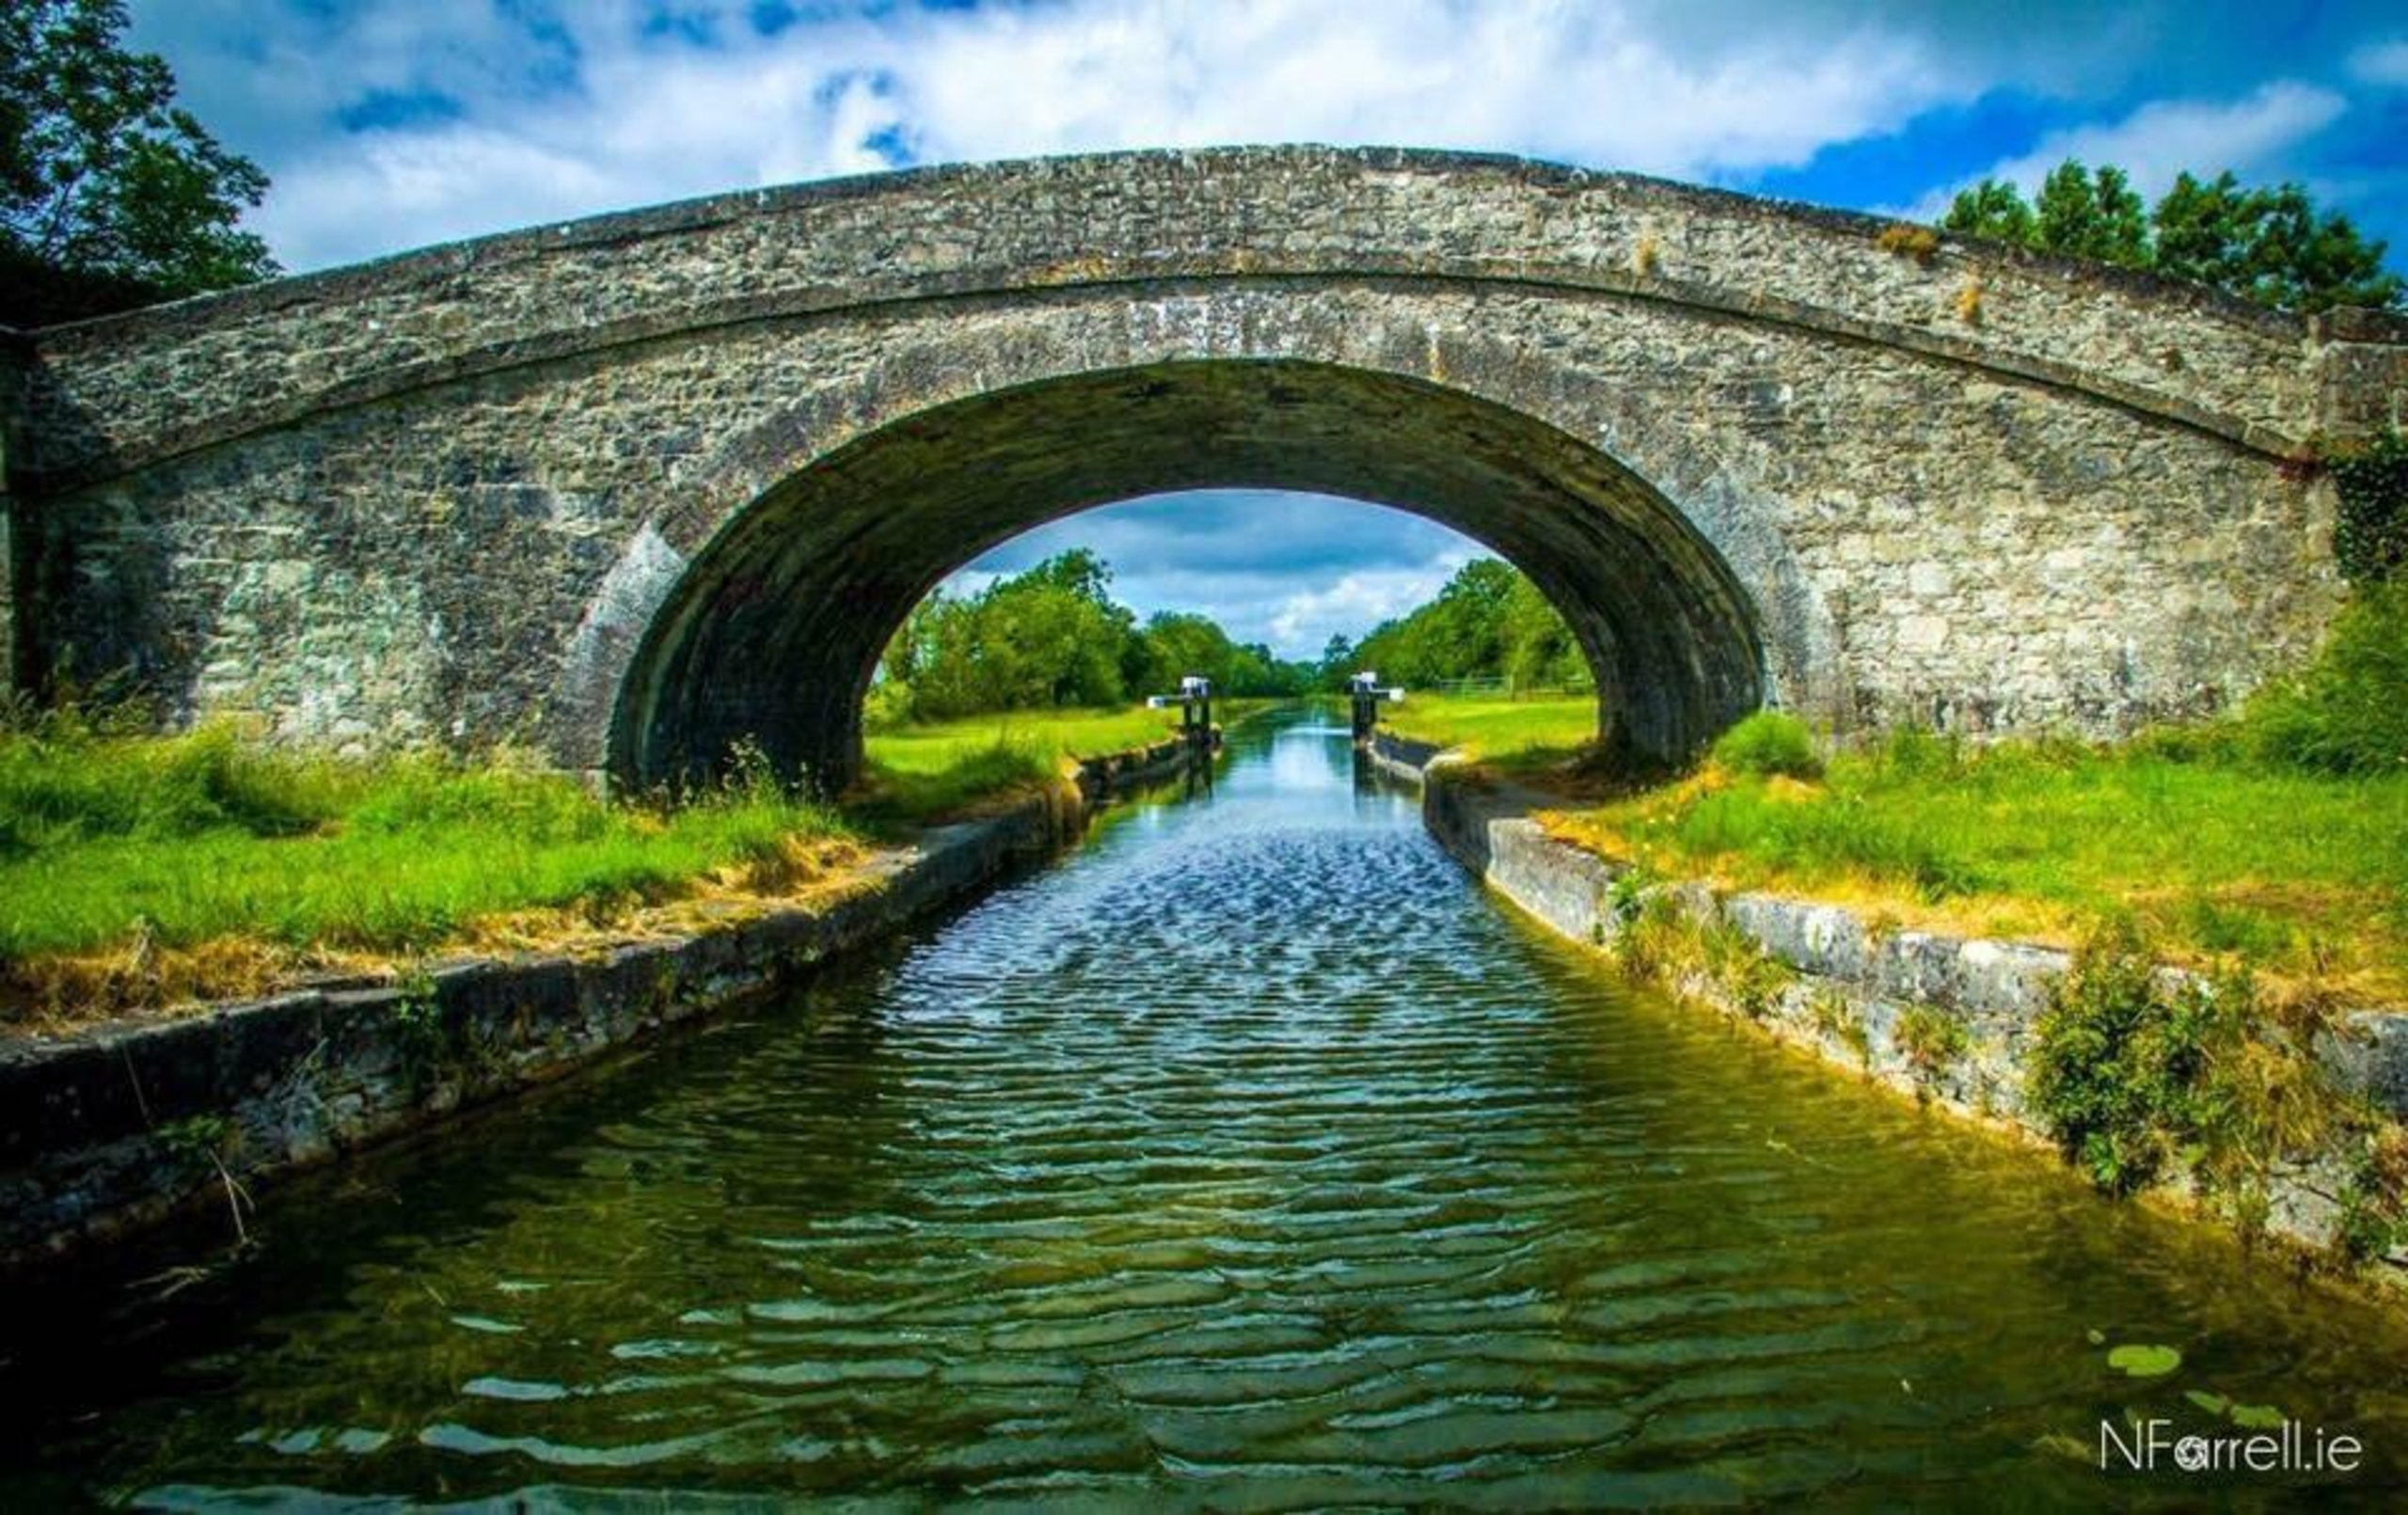 Edenderry Swimming Pool | | UPDATED June 2020 Top Tips